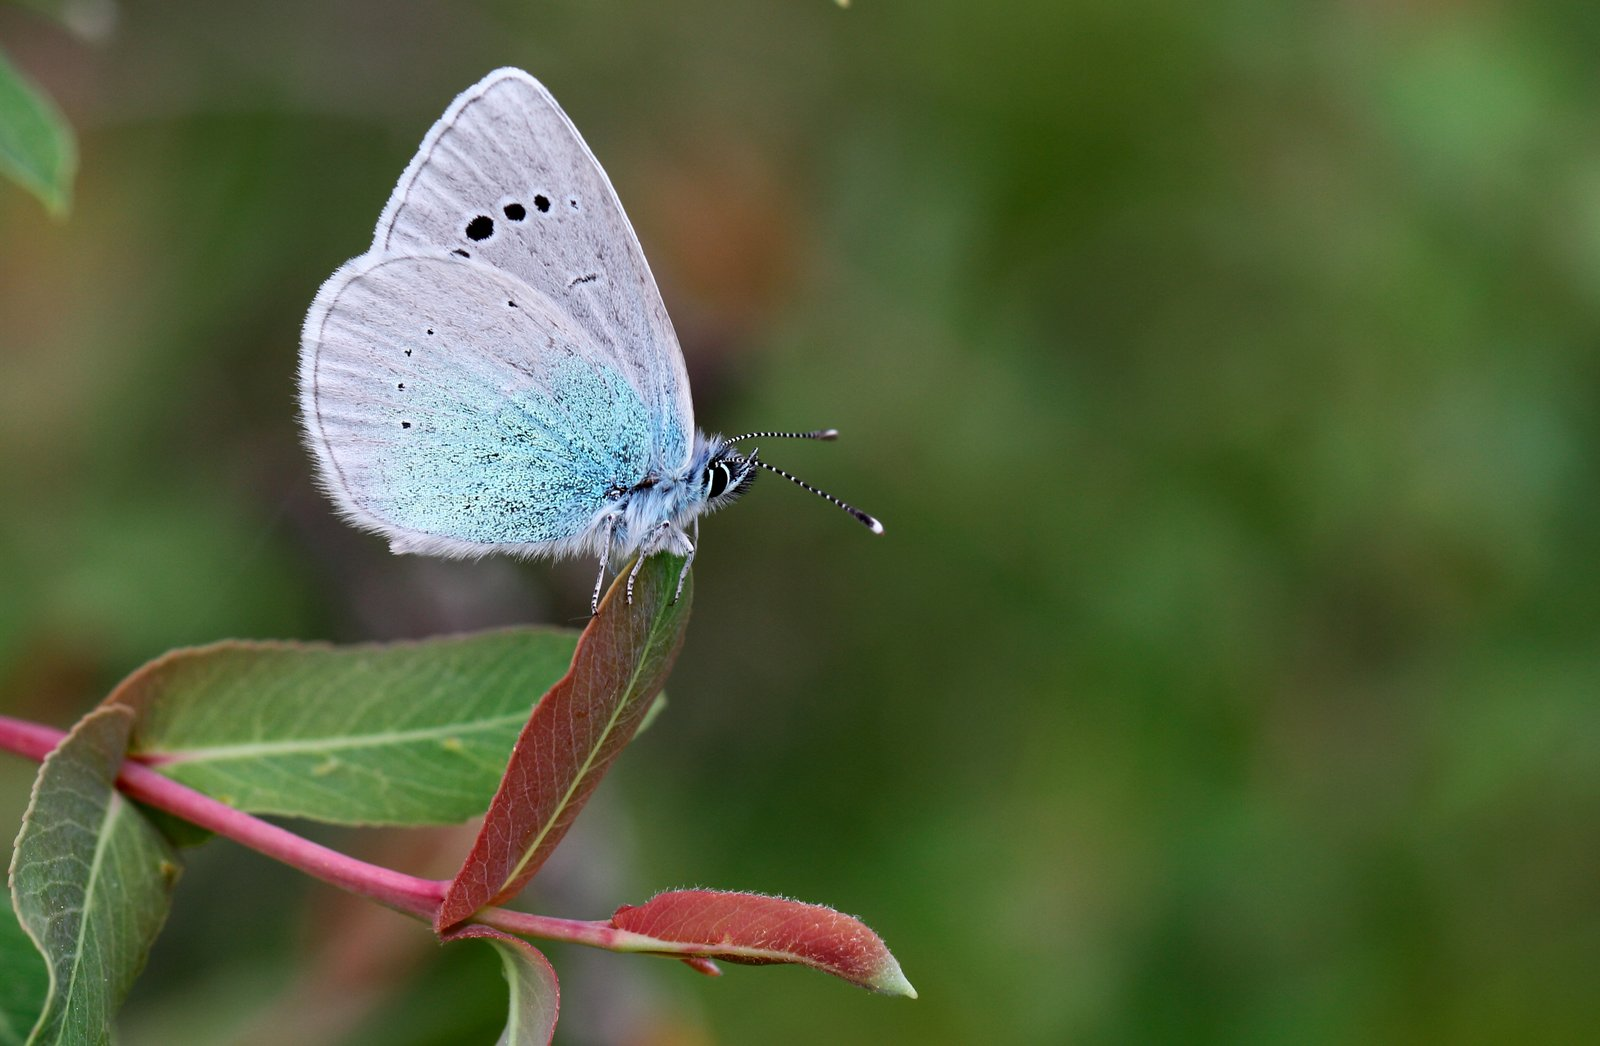 Kløverblåfugl, Glaucopsyche alexis